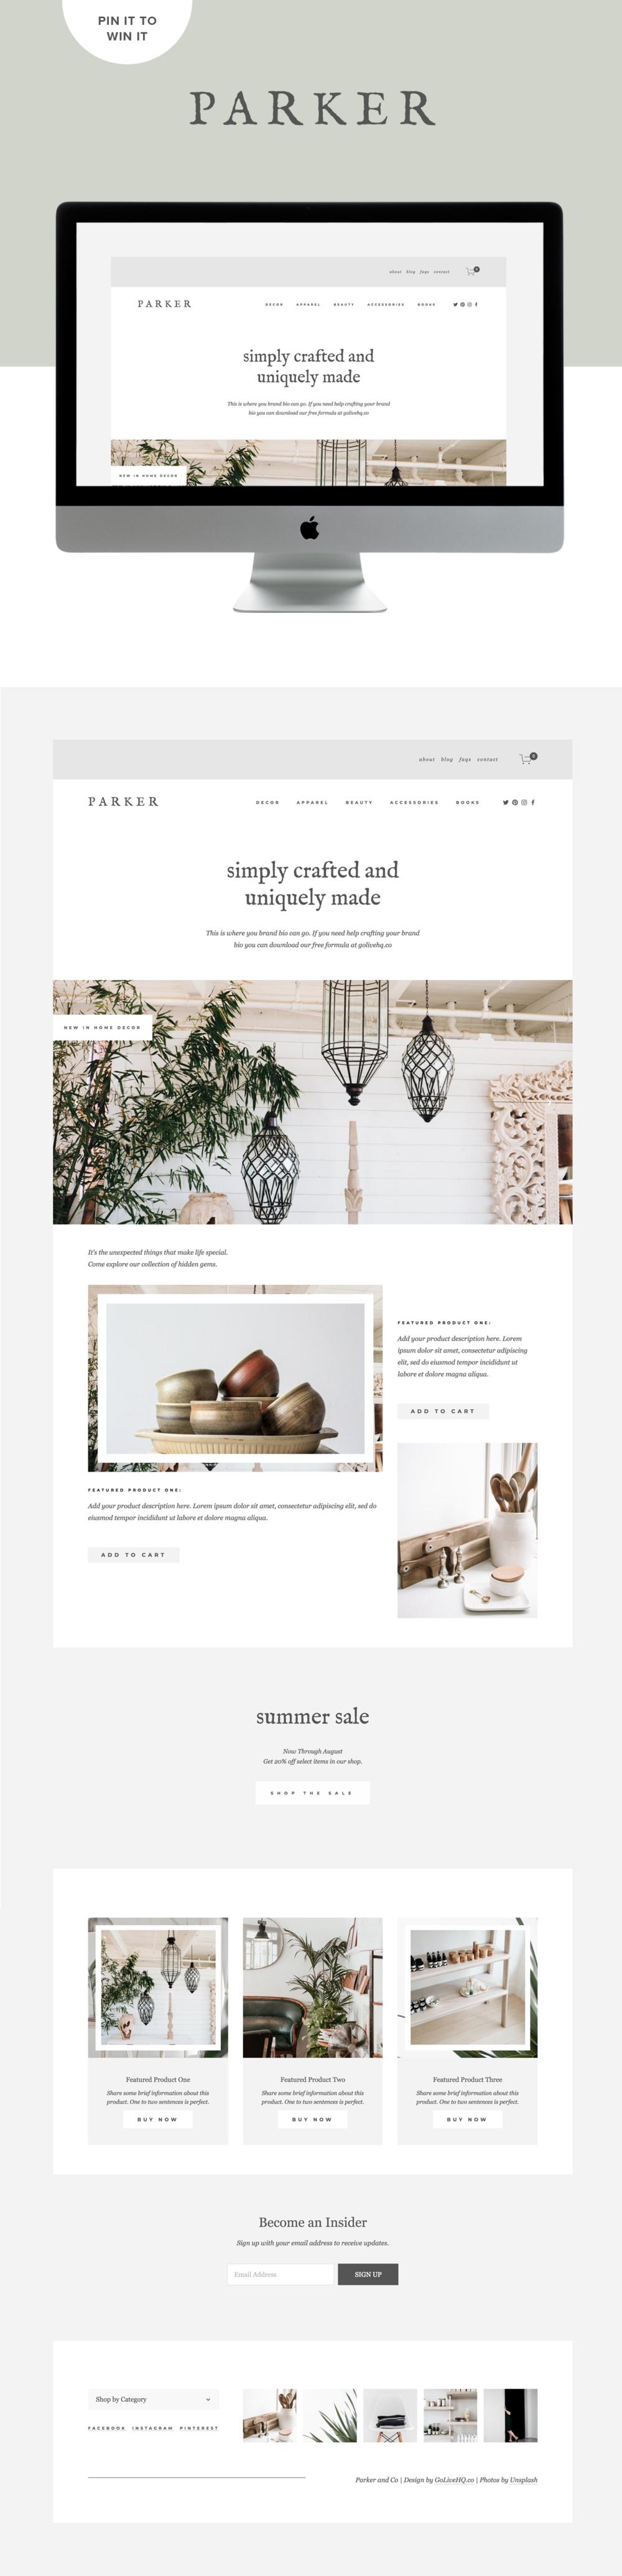 Modern, Minimal E-Commerce Website Design For Shops | Design By Go Live HQ